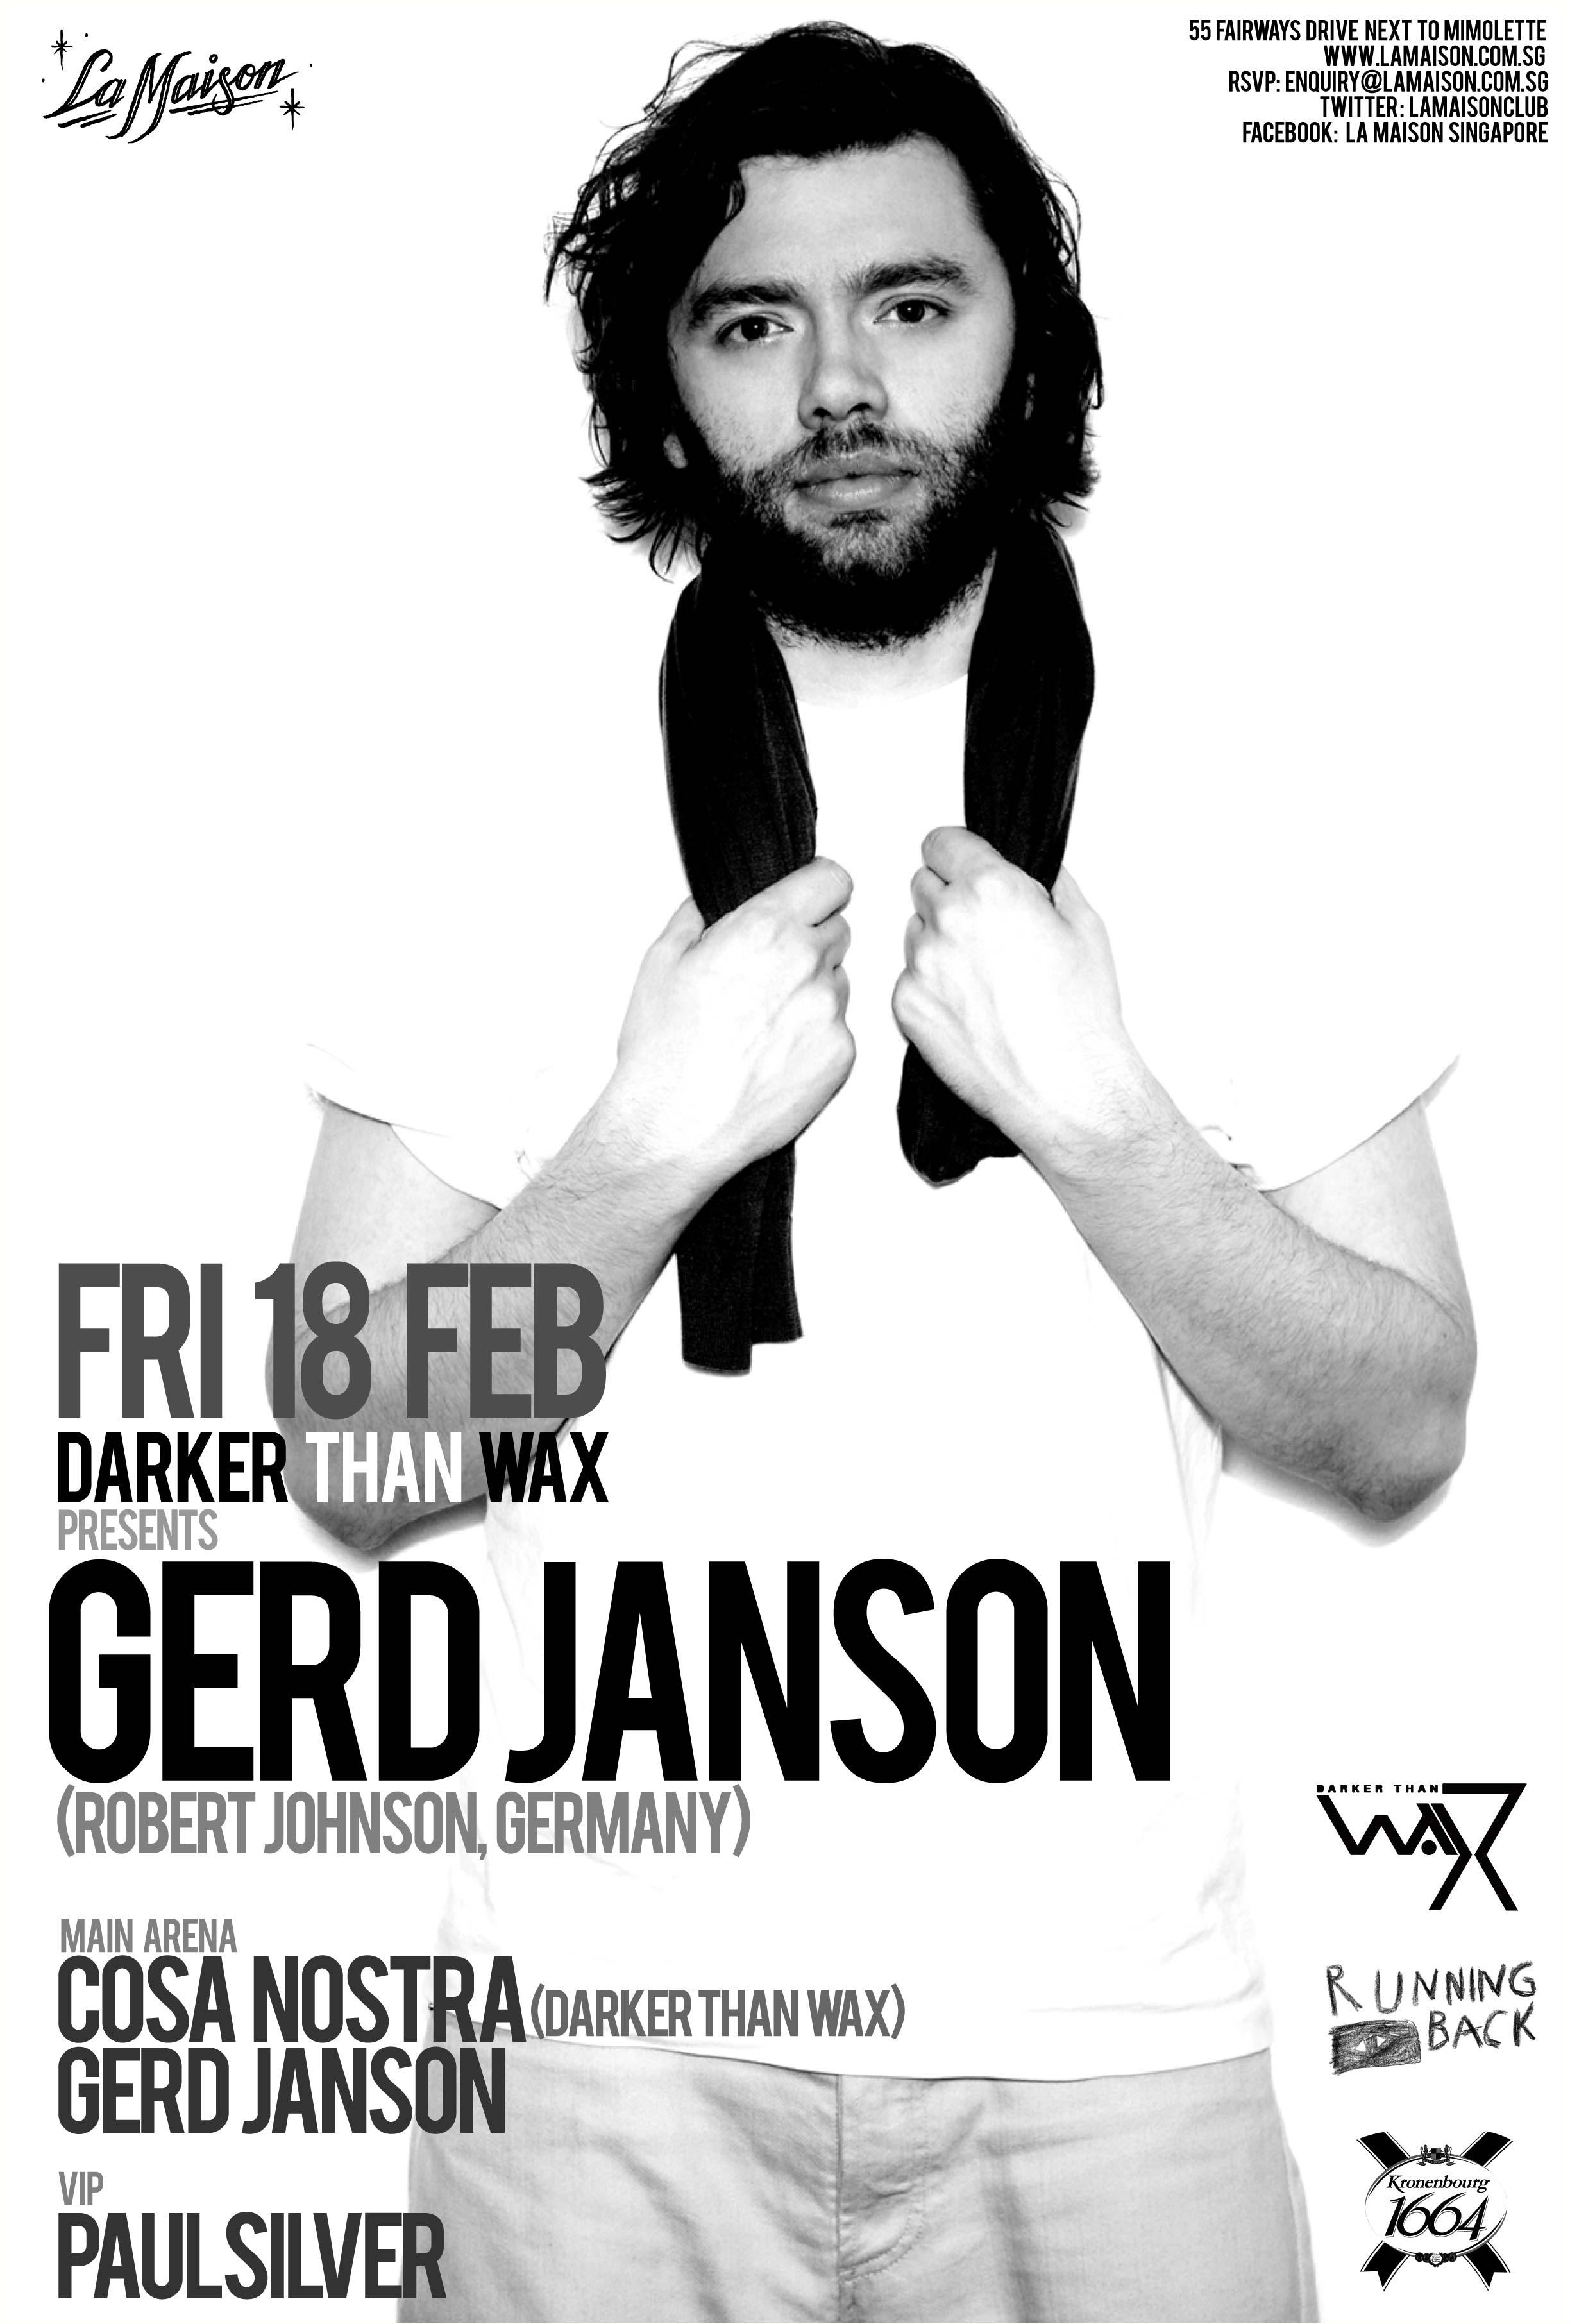 18 feb - Gerd Janson EDM FINAL .jpg